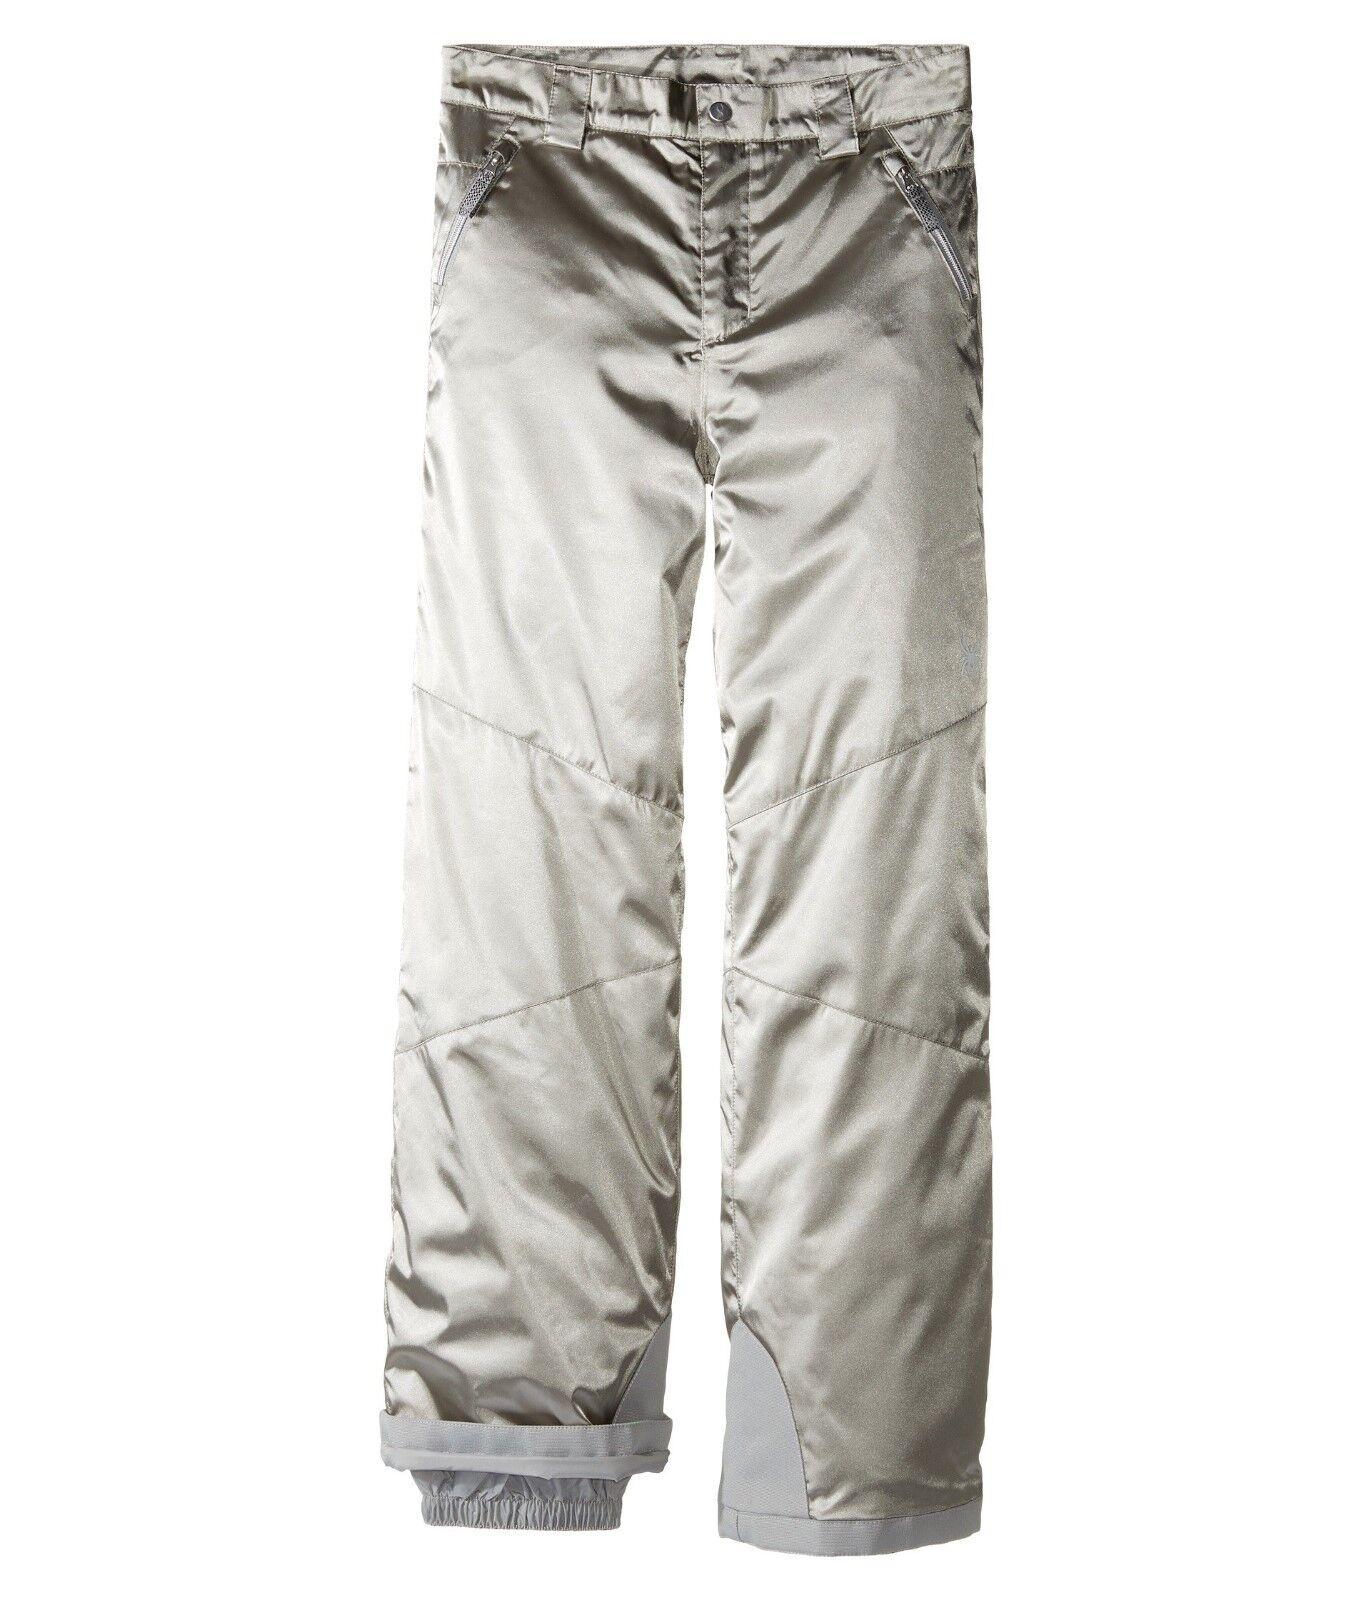 Spyder Girls Ski Snowboarding Thrill Athletic Fit Pants, Size 18 (Girl's), New